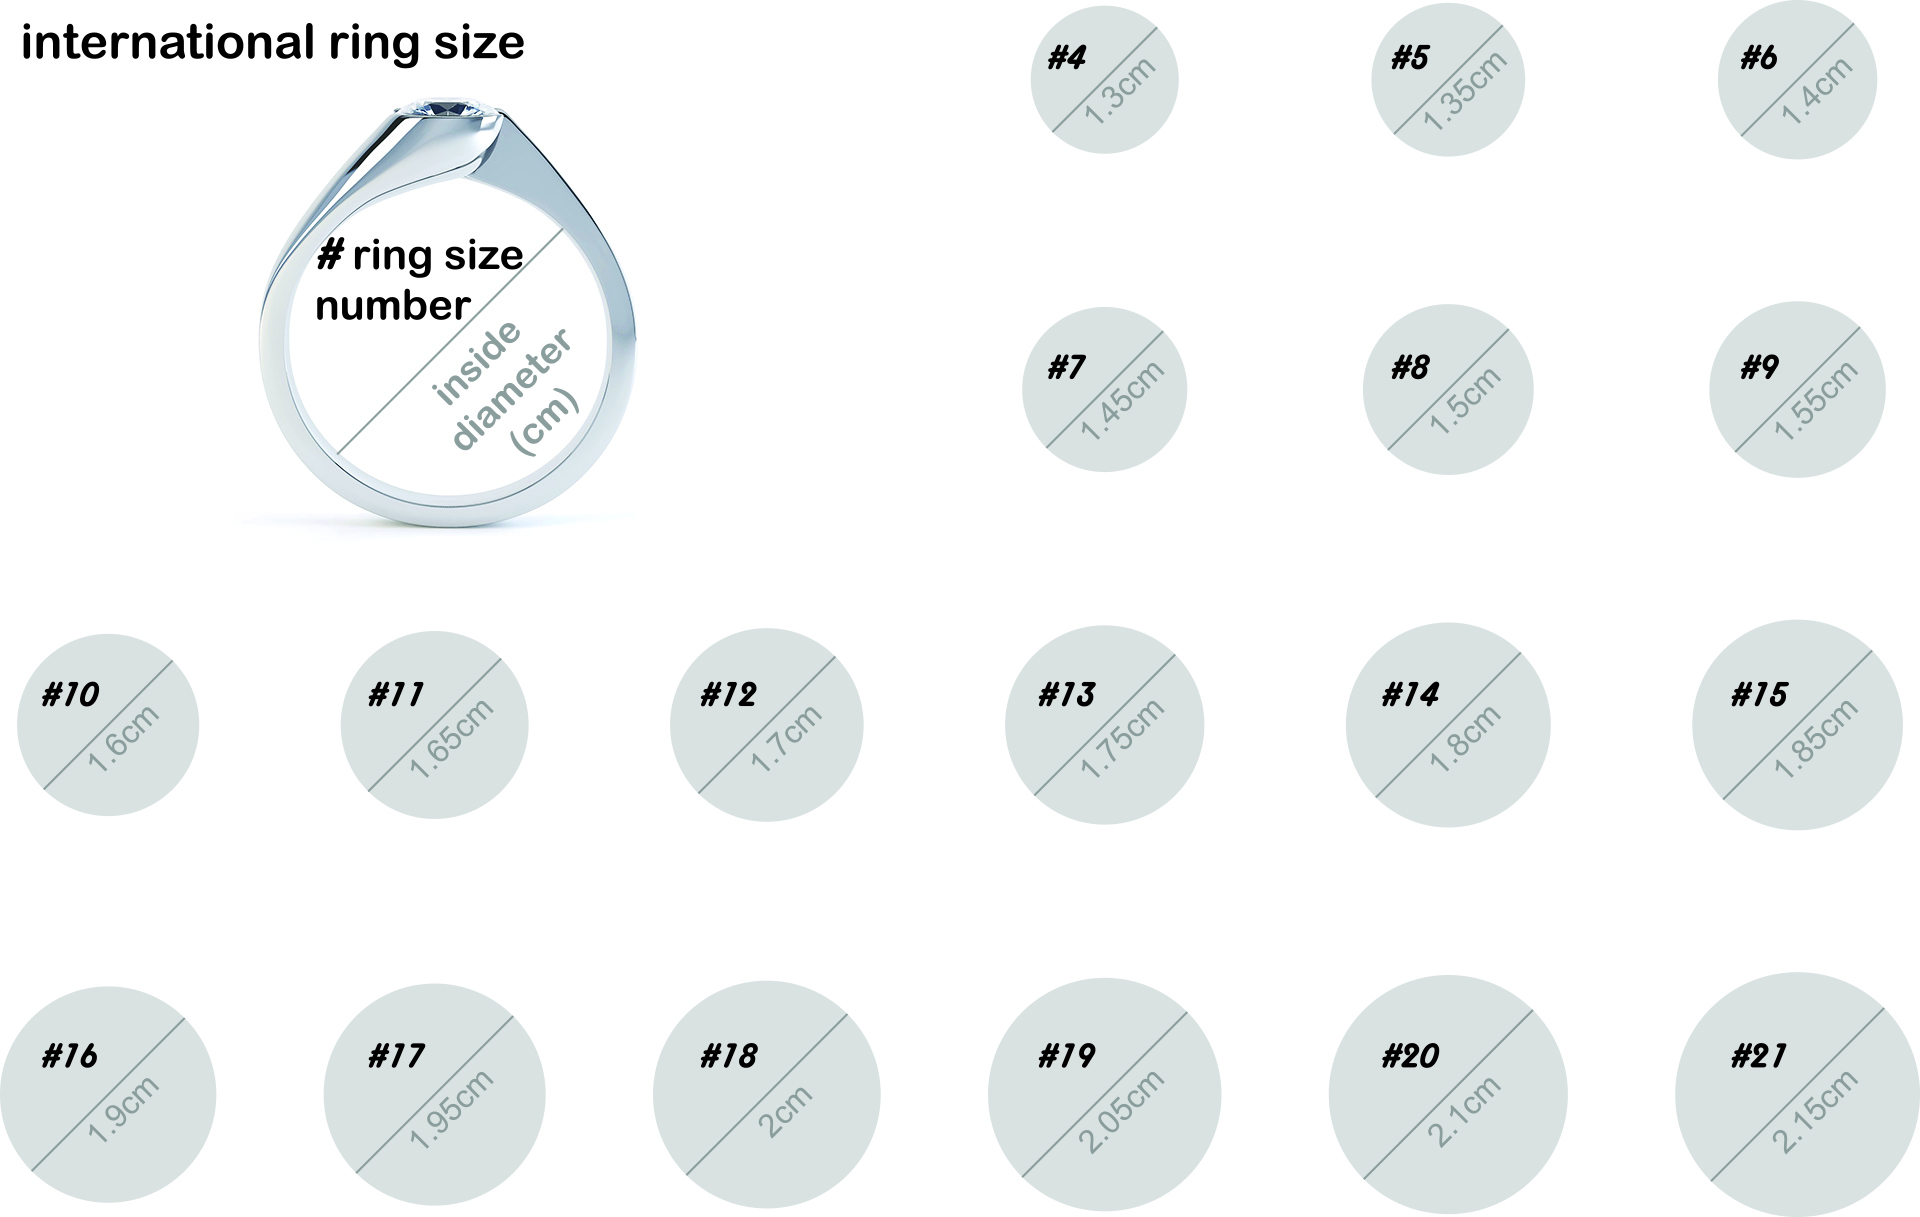 mittag jewelry|戒指國際圍尺寸圖